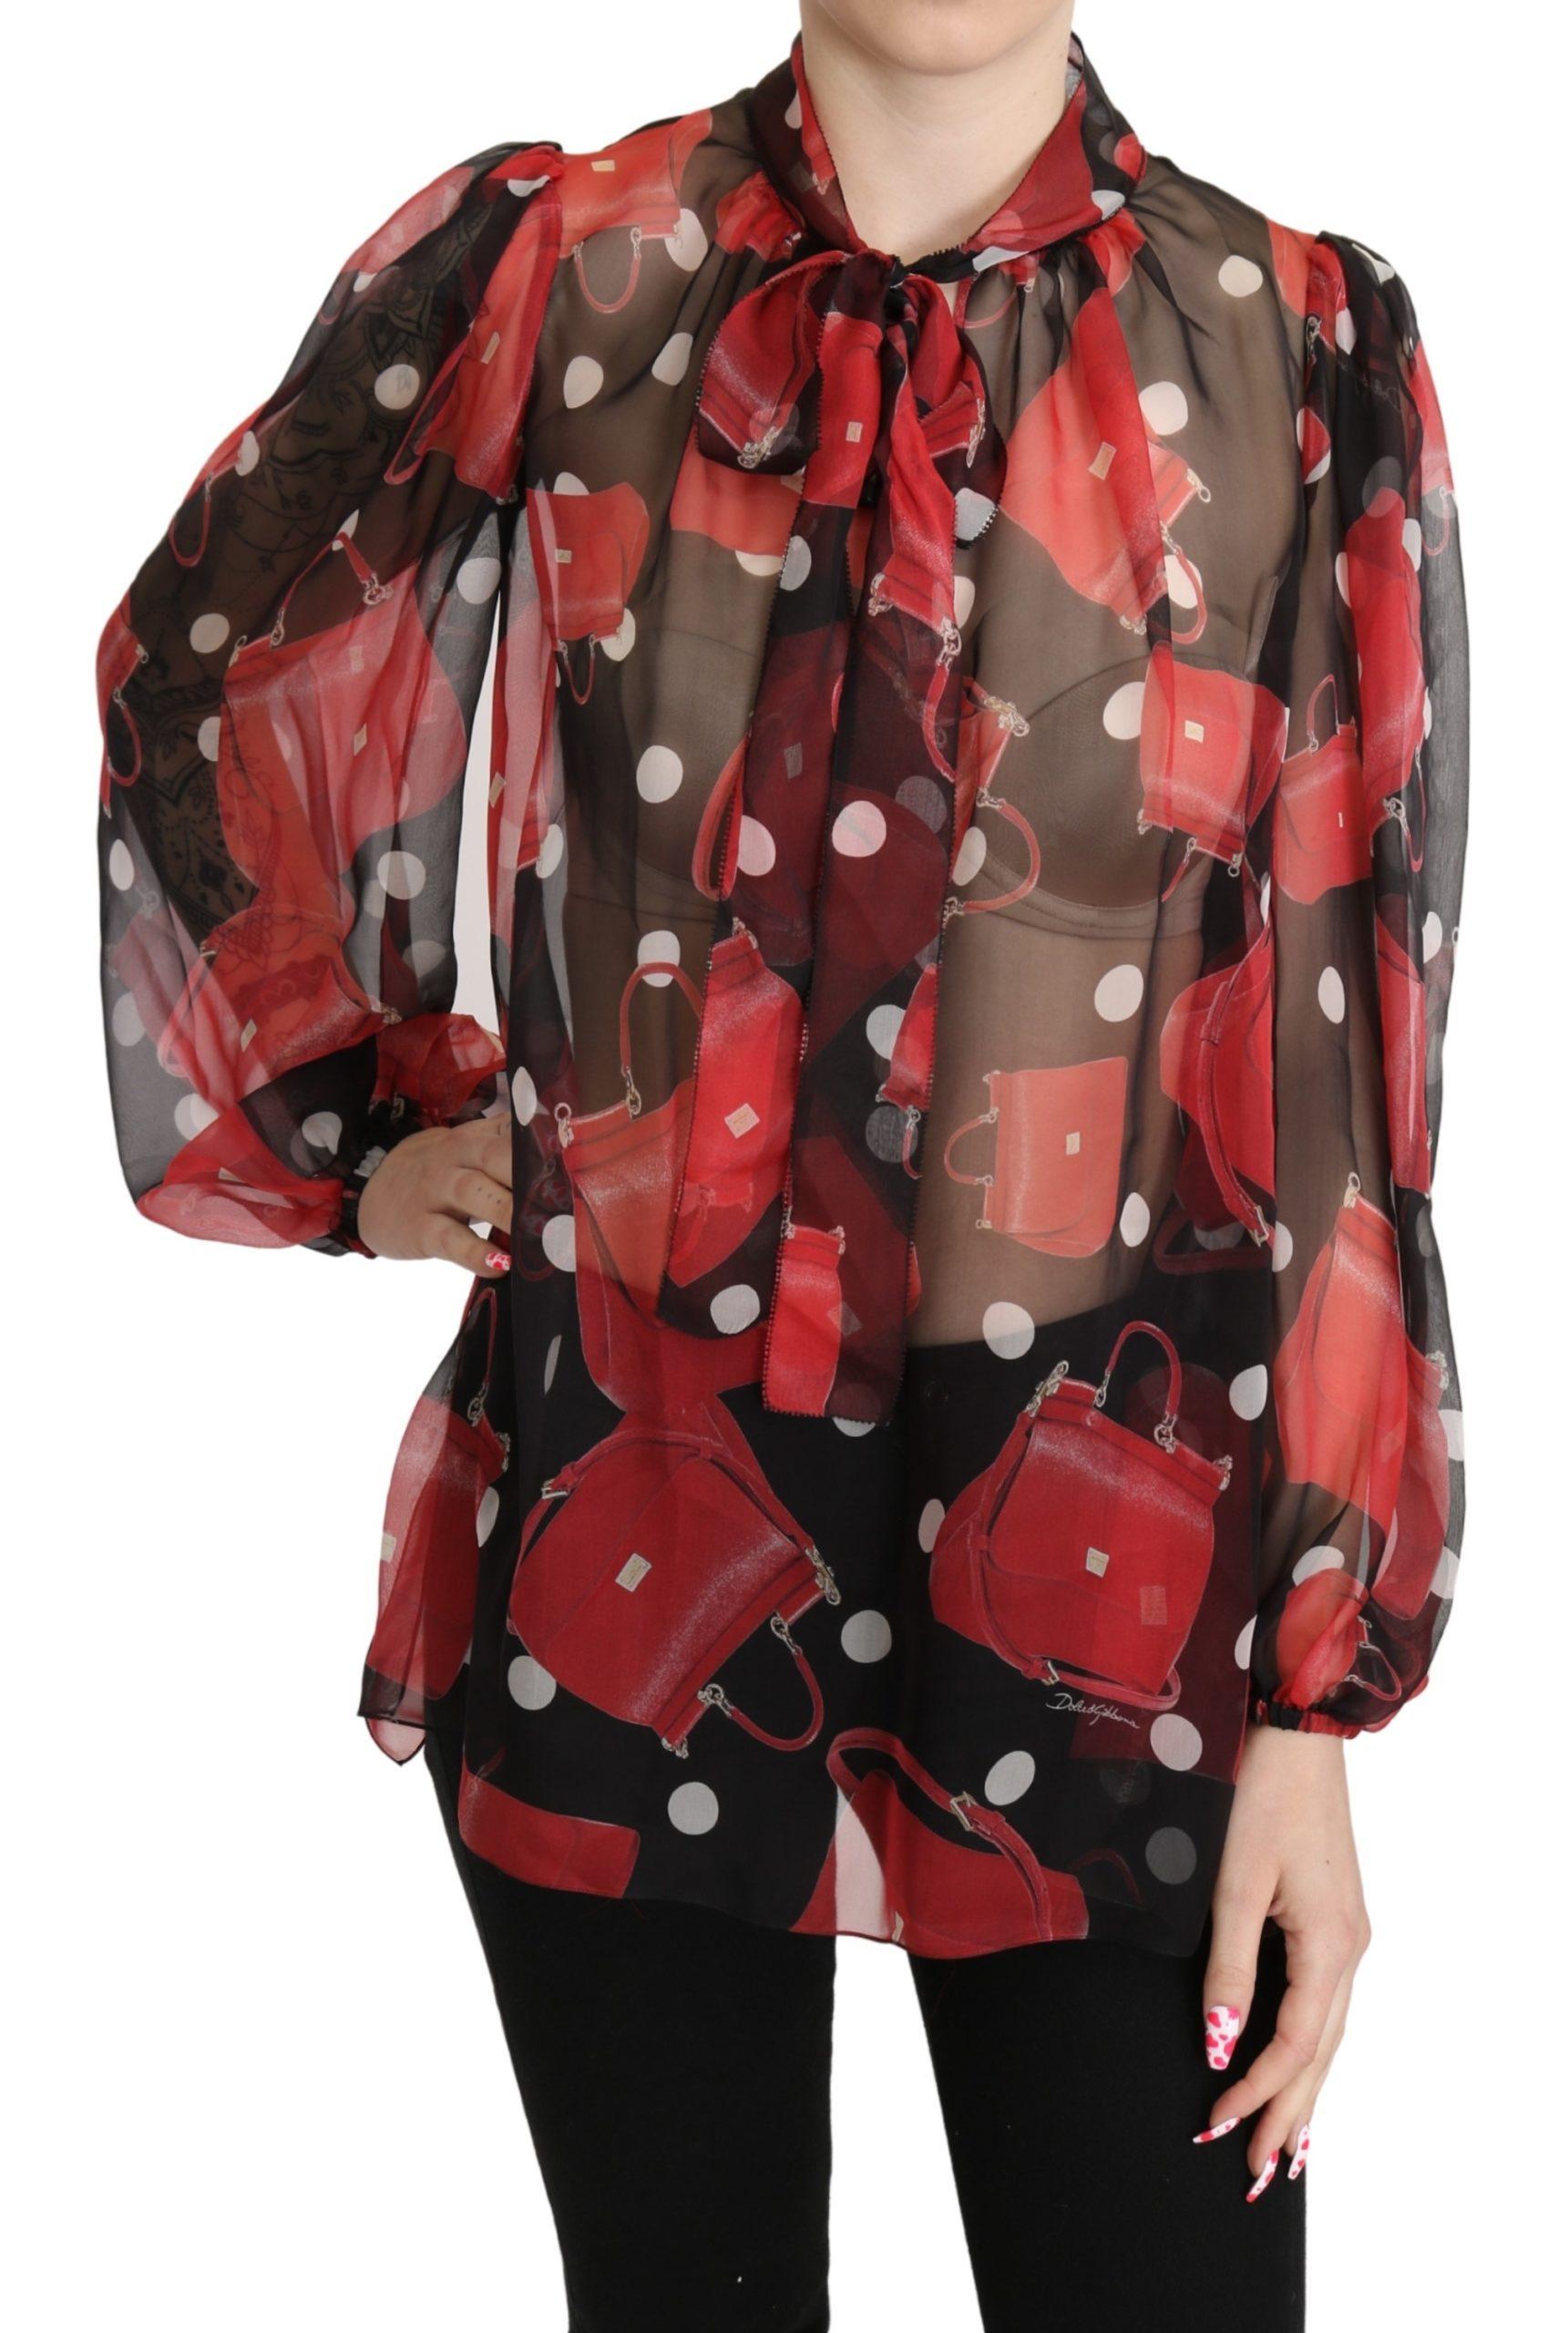 Dolce & Gabbana Women's Sheer Sicily Top Red TSH5255 - IT36 | XS